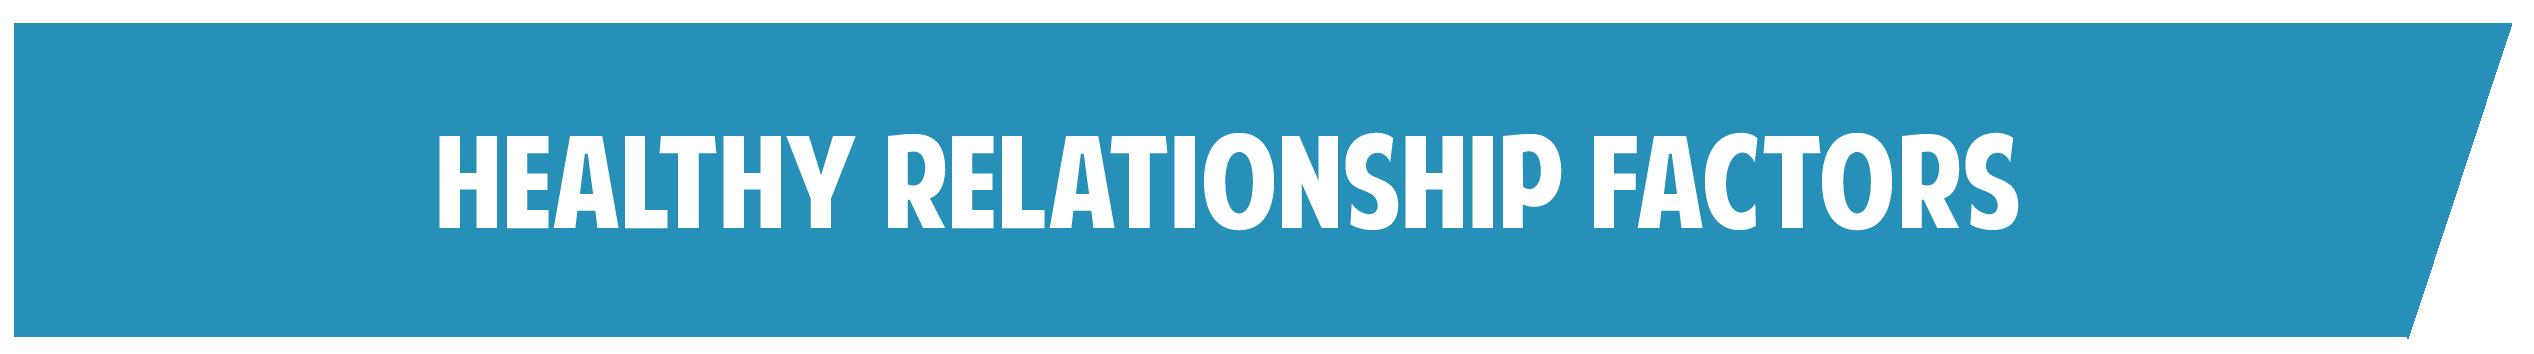 Healthy Relationship Factors